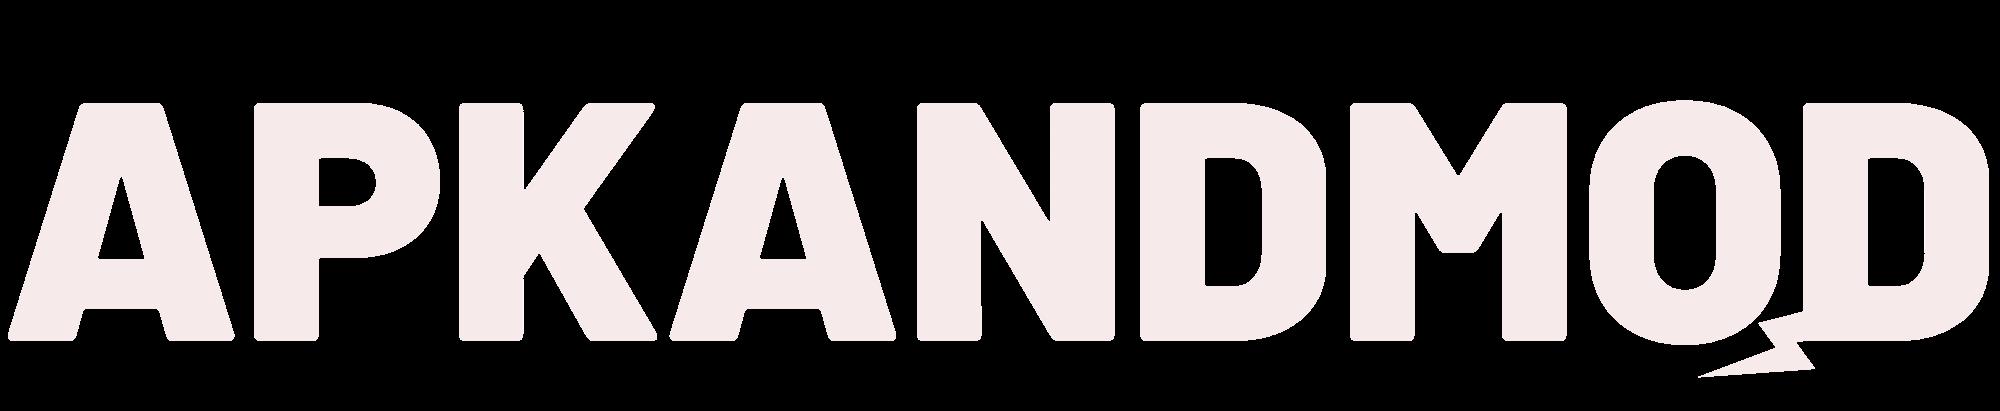 apk and mod logo